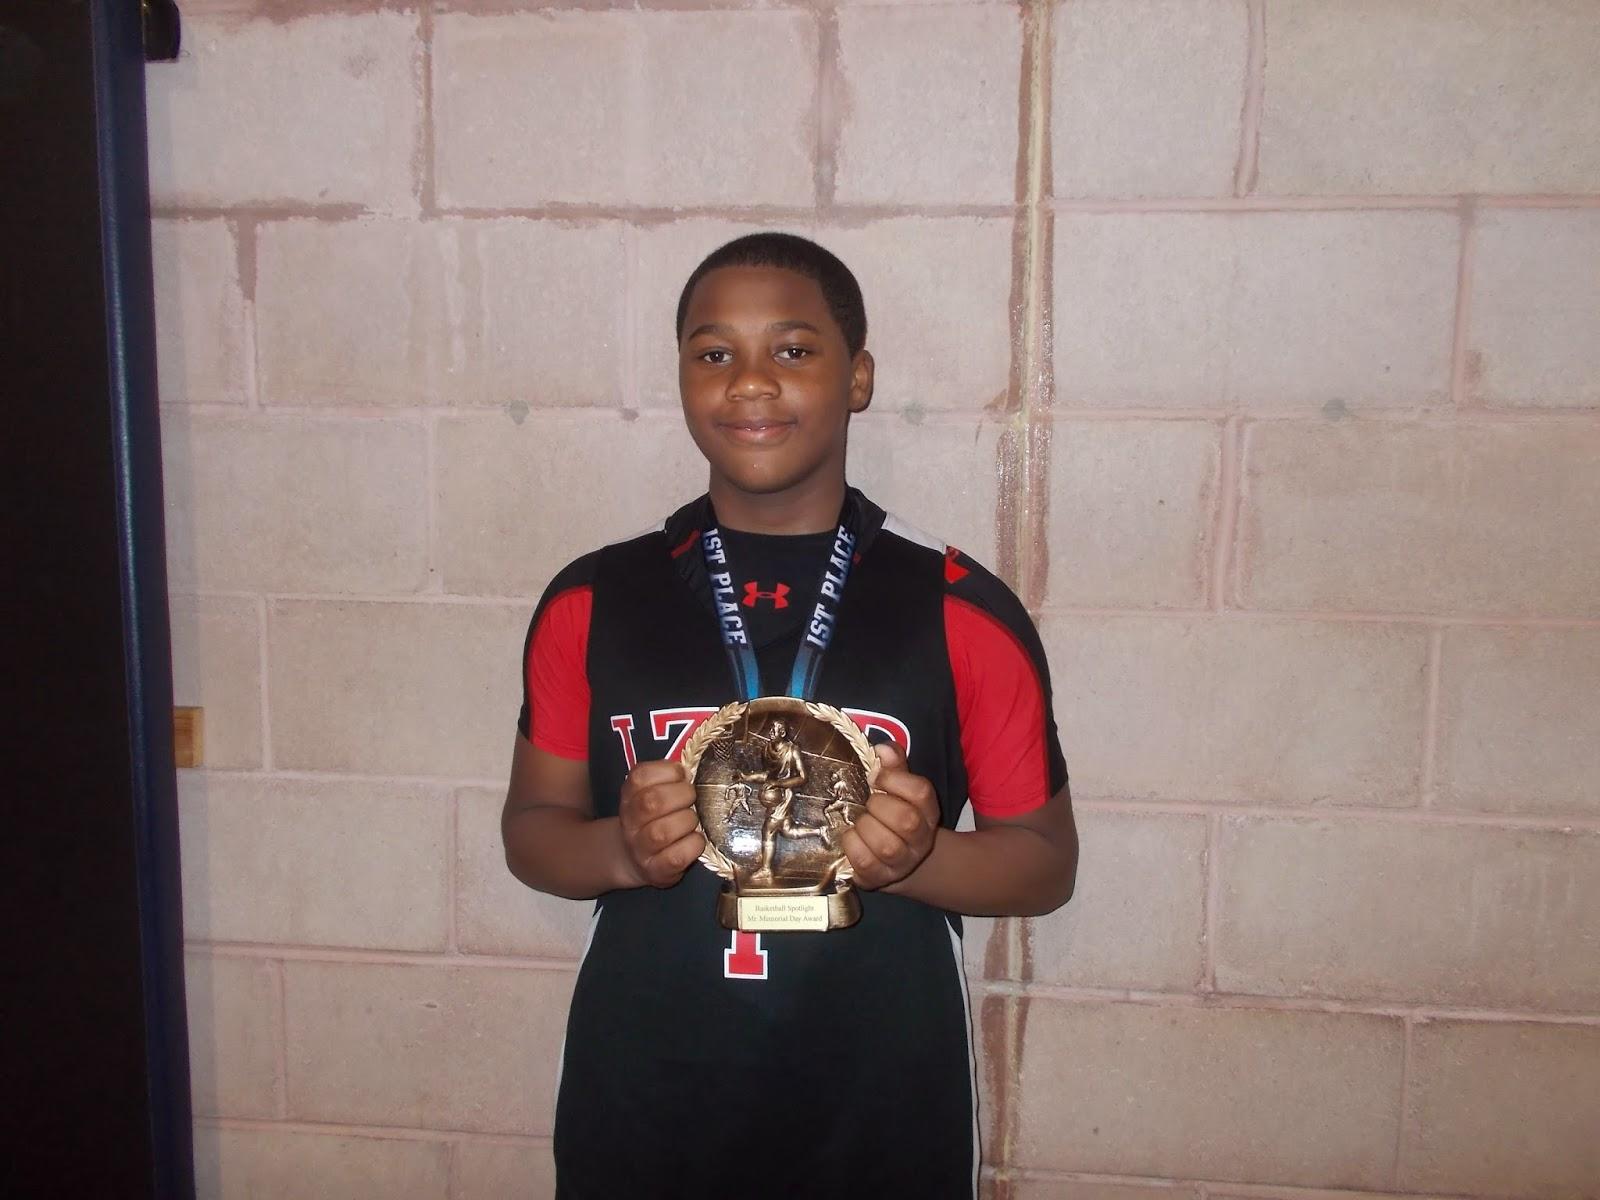 Zion bethea basketball